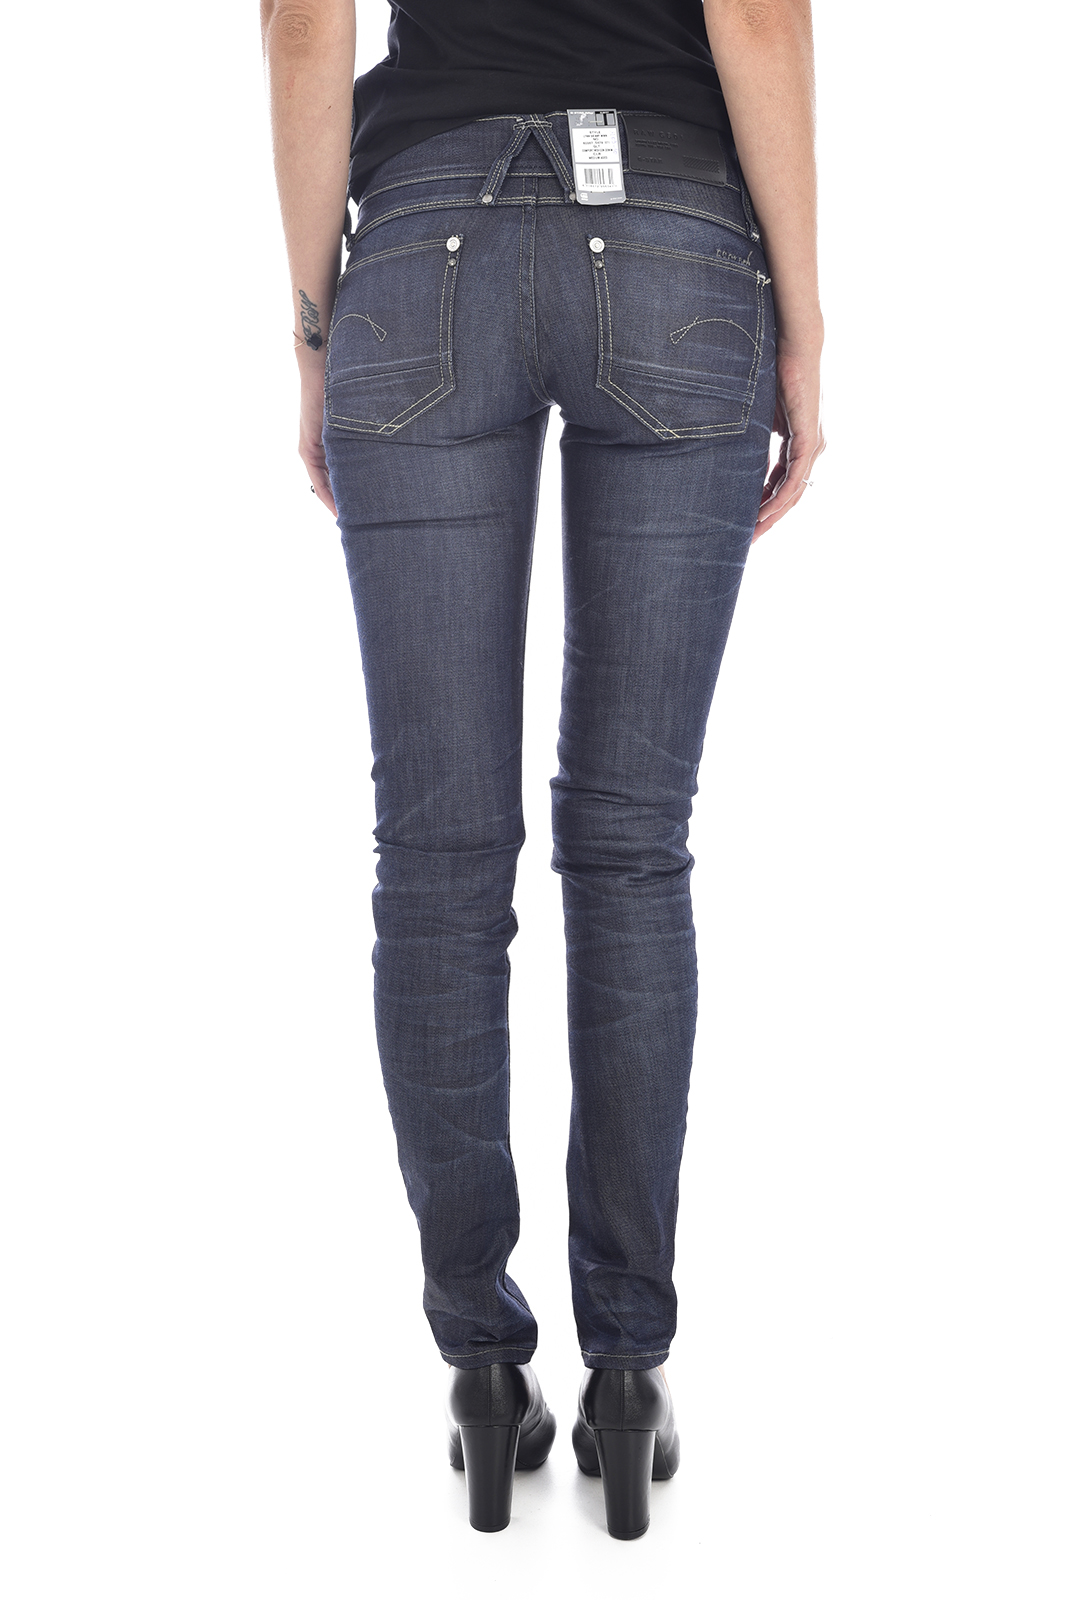 Jeans   G-star 60367-5479-071 lynn bleu